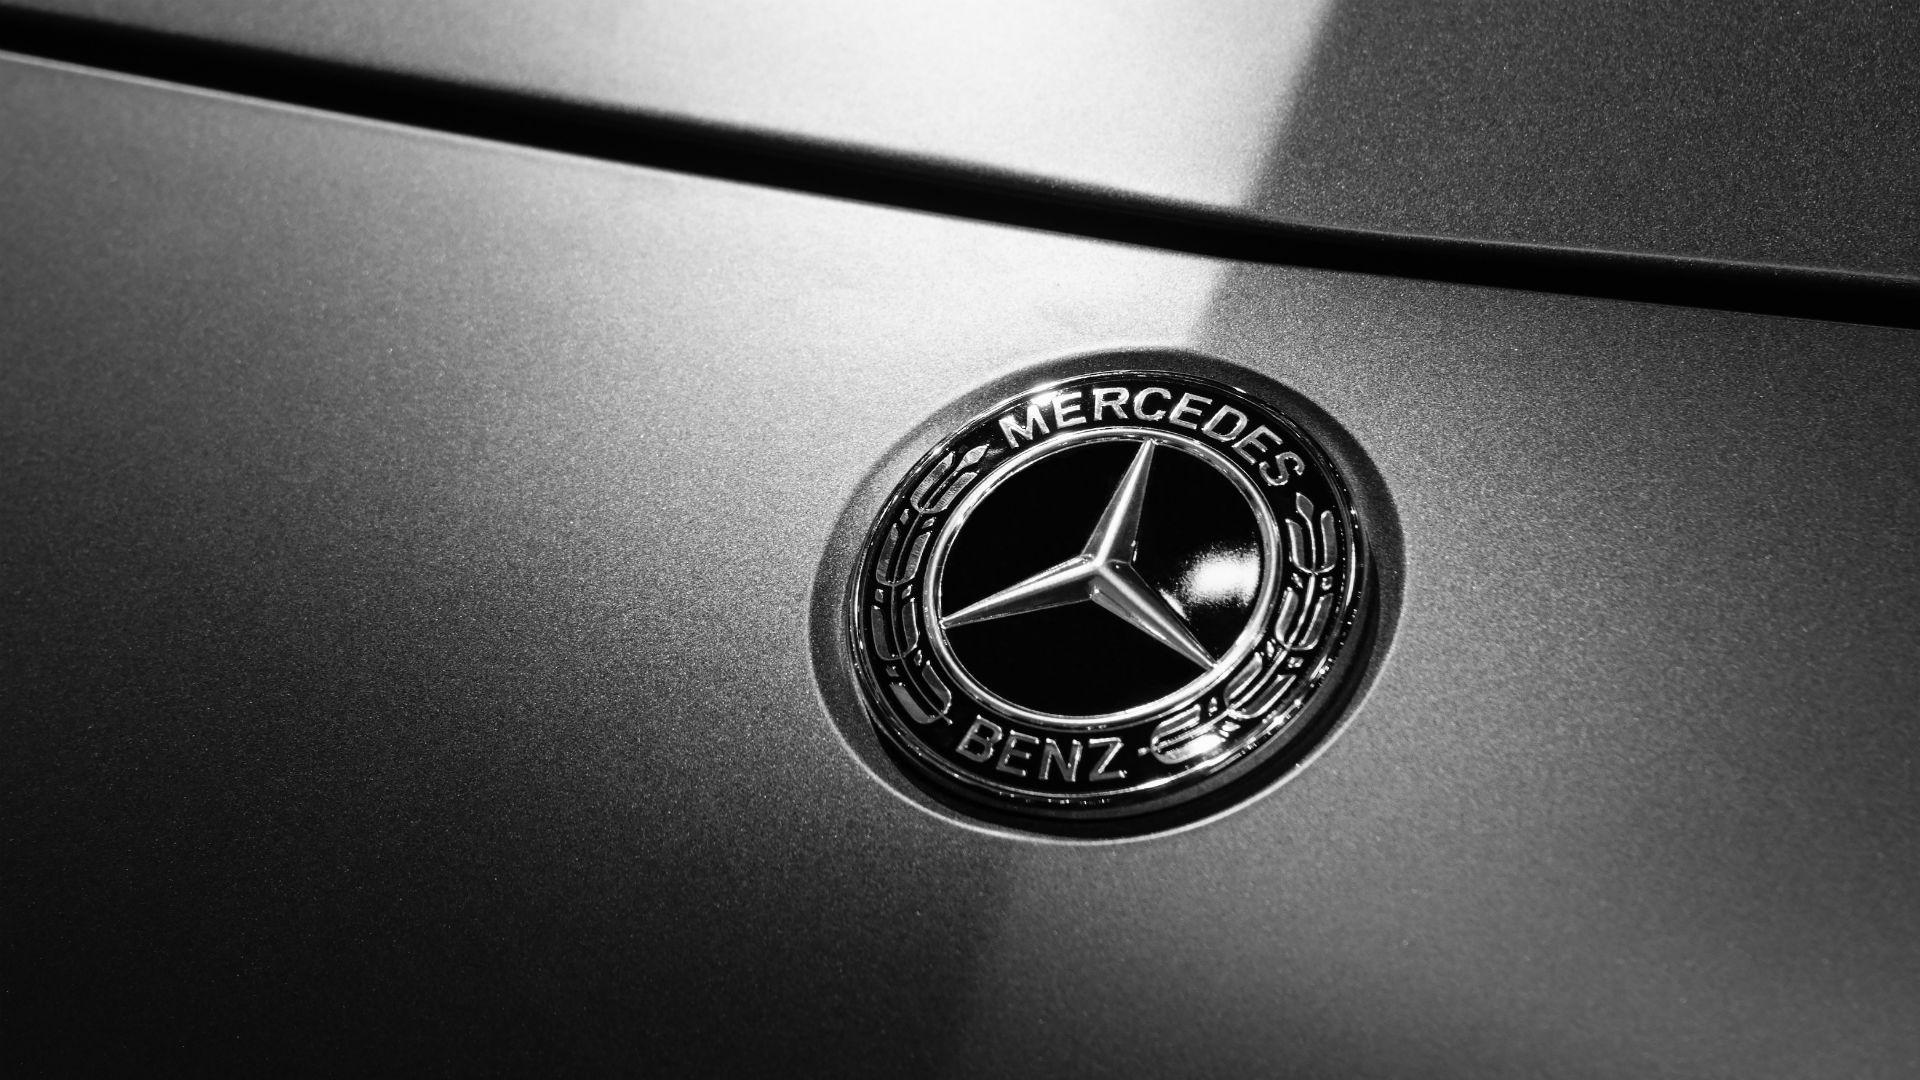 Mercedes-Benz influential car brand